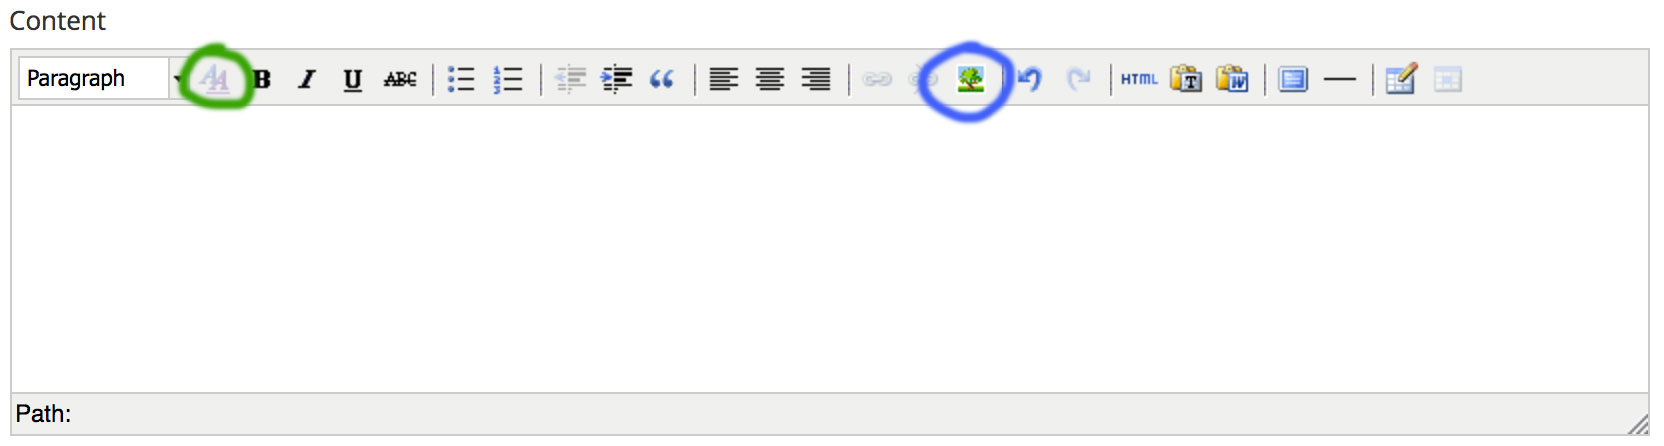 nm-mega-theme-docs-content-editor-images.jpg